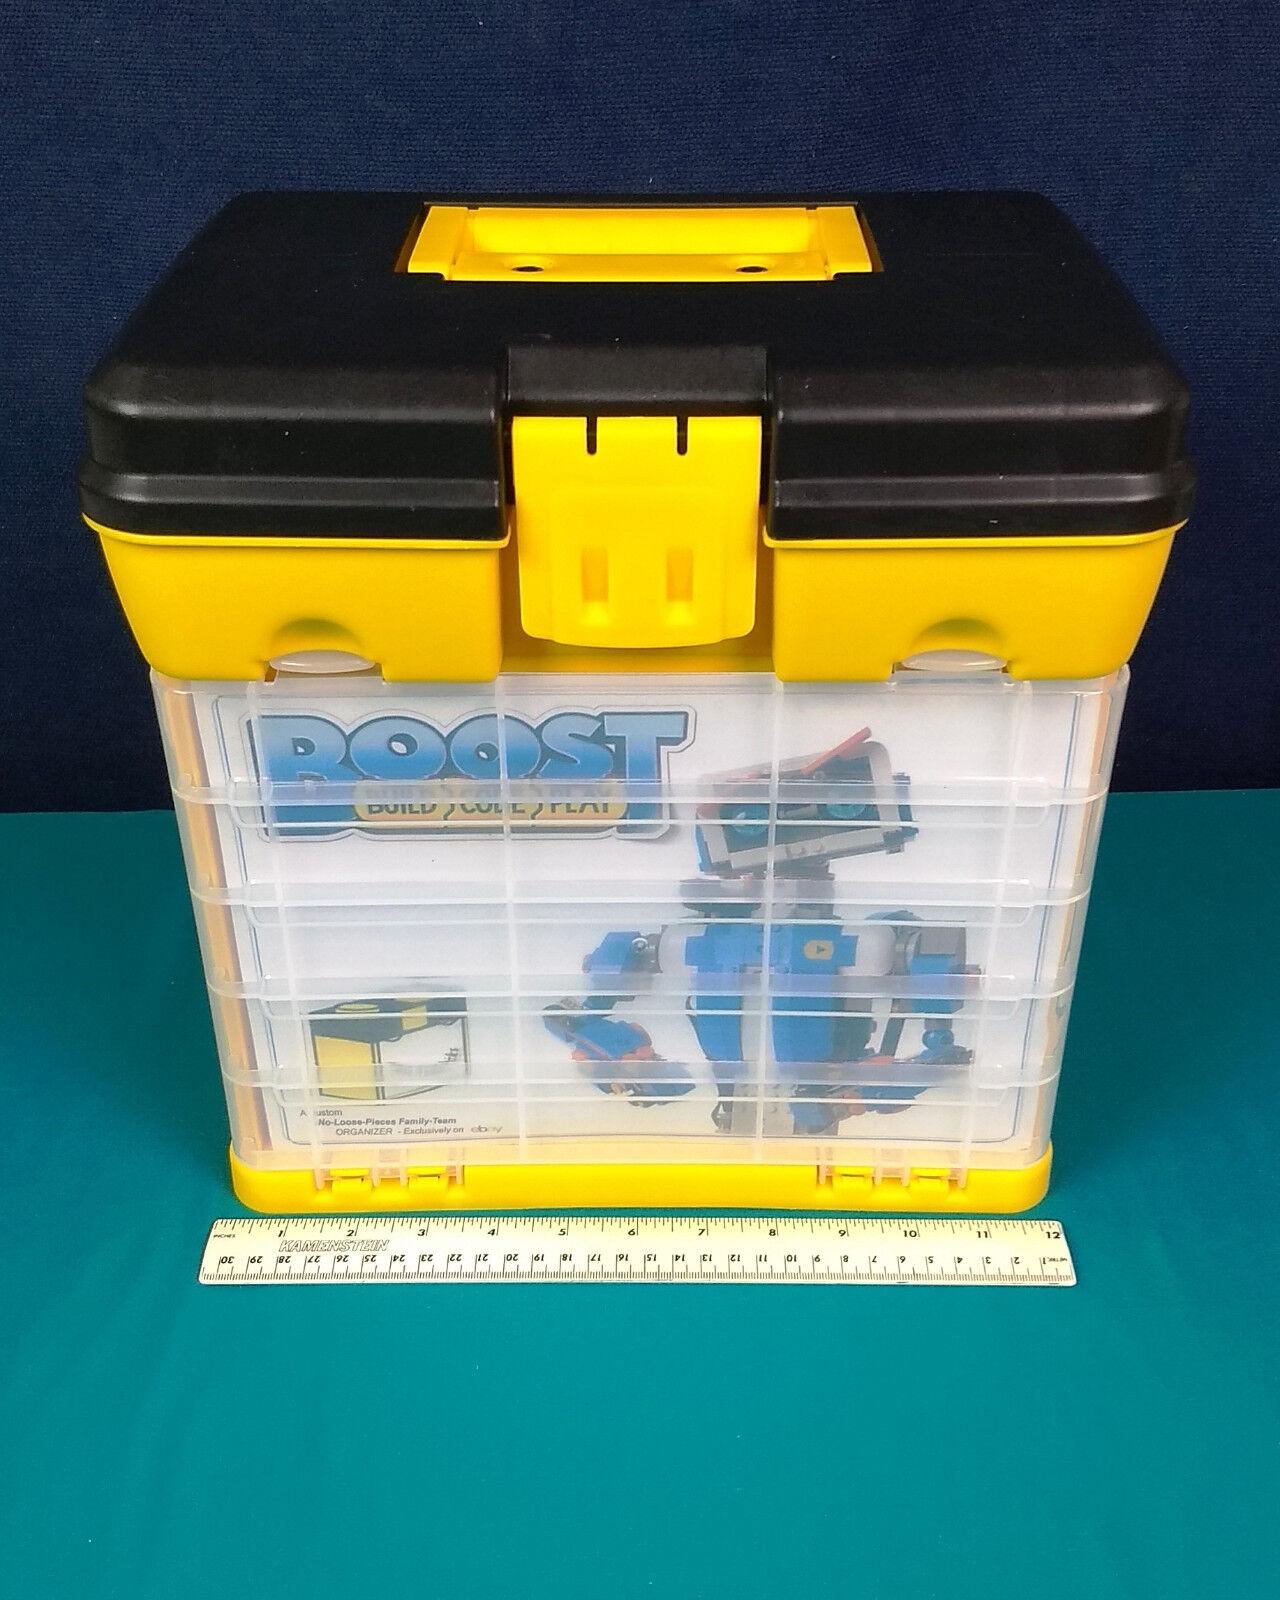 NEW Custom ORGANIZER / STORAGE Drawer / Bin SYSTEM for the Lego BOOST Set 17101